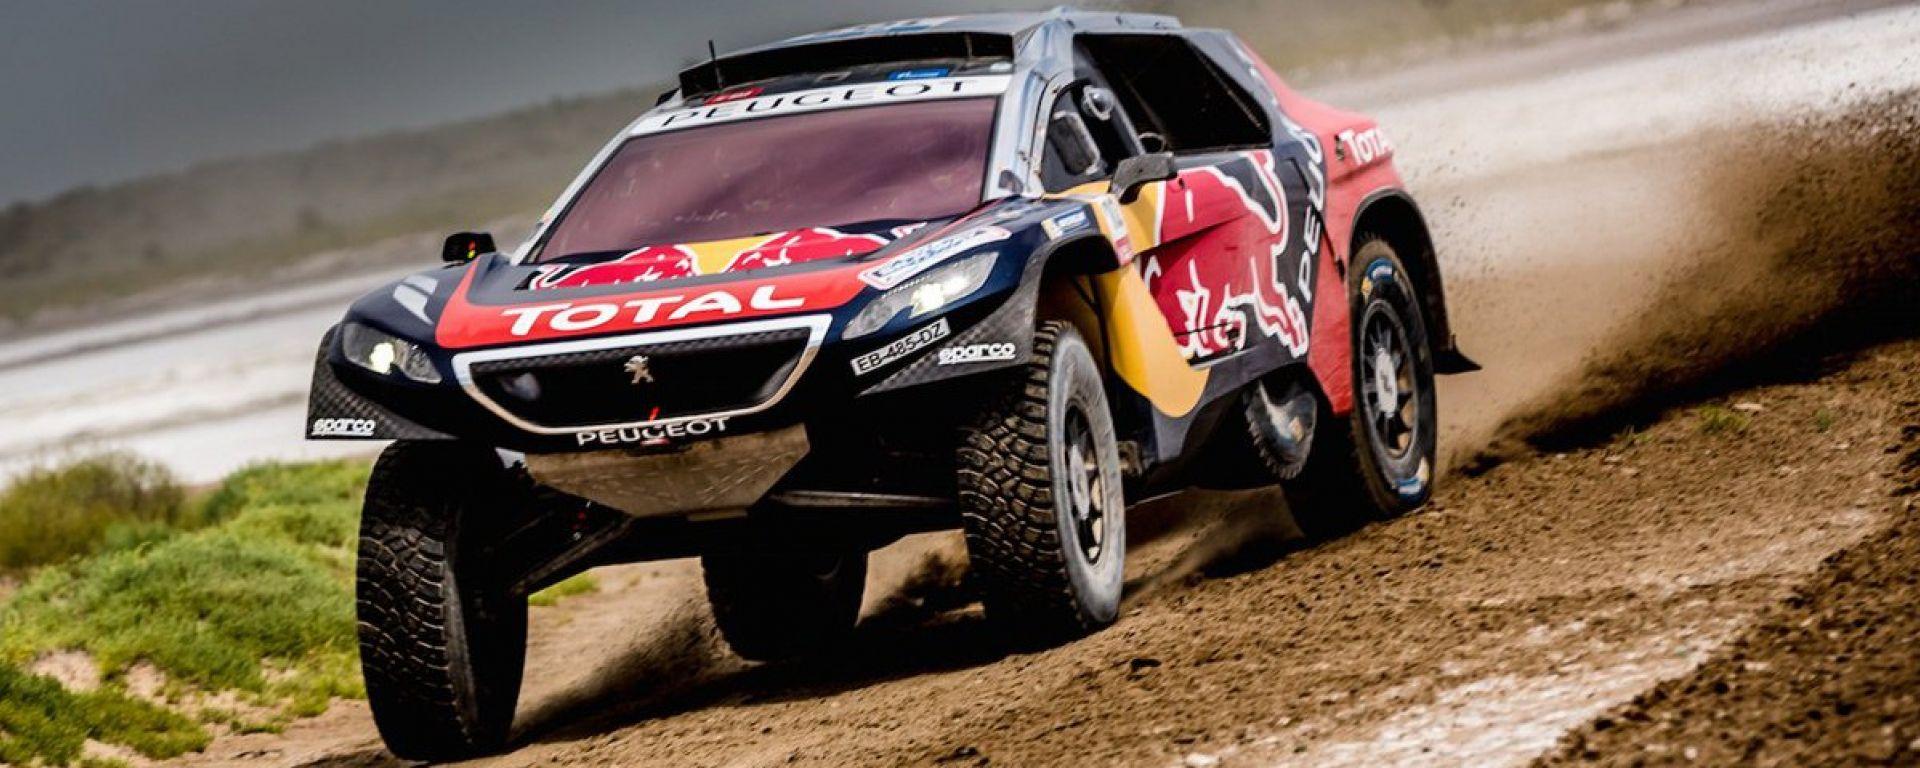 Silk Way Rally Tappa 6: Peugeot non vince ma resta in testa